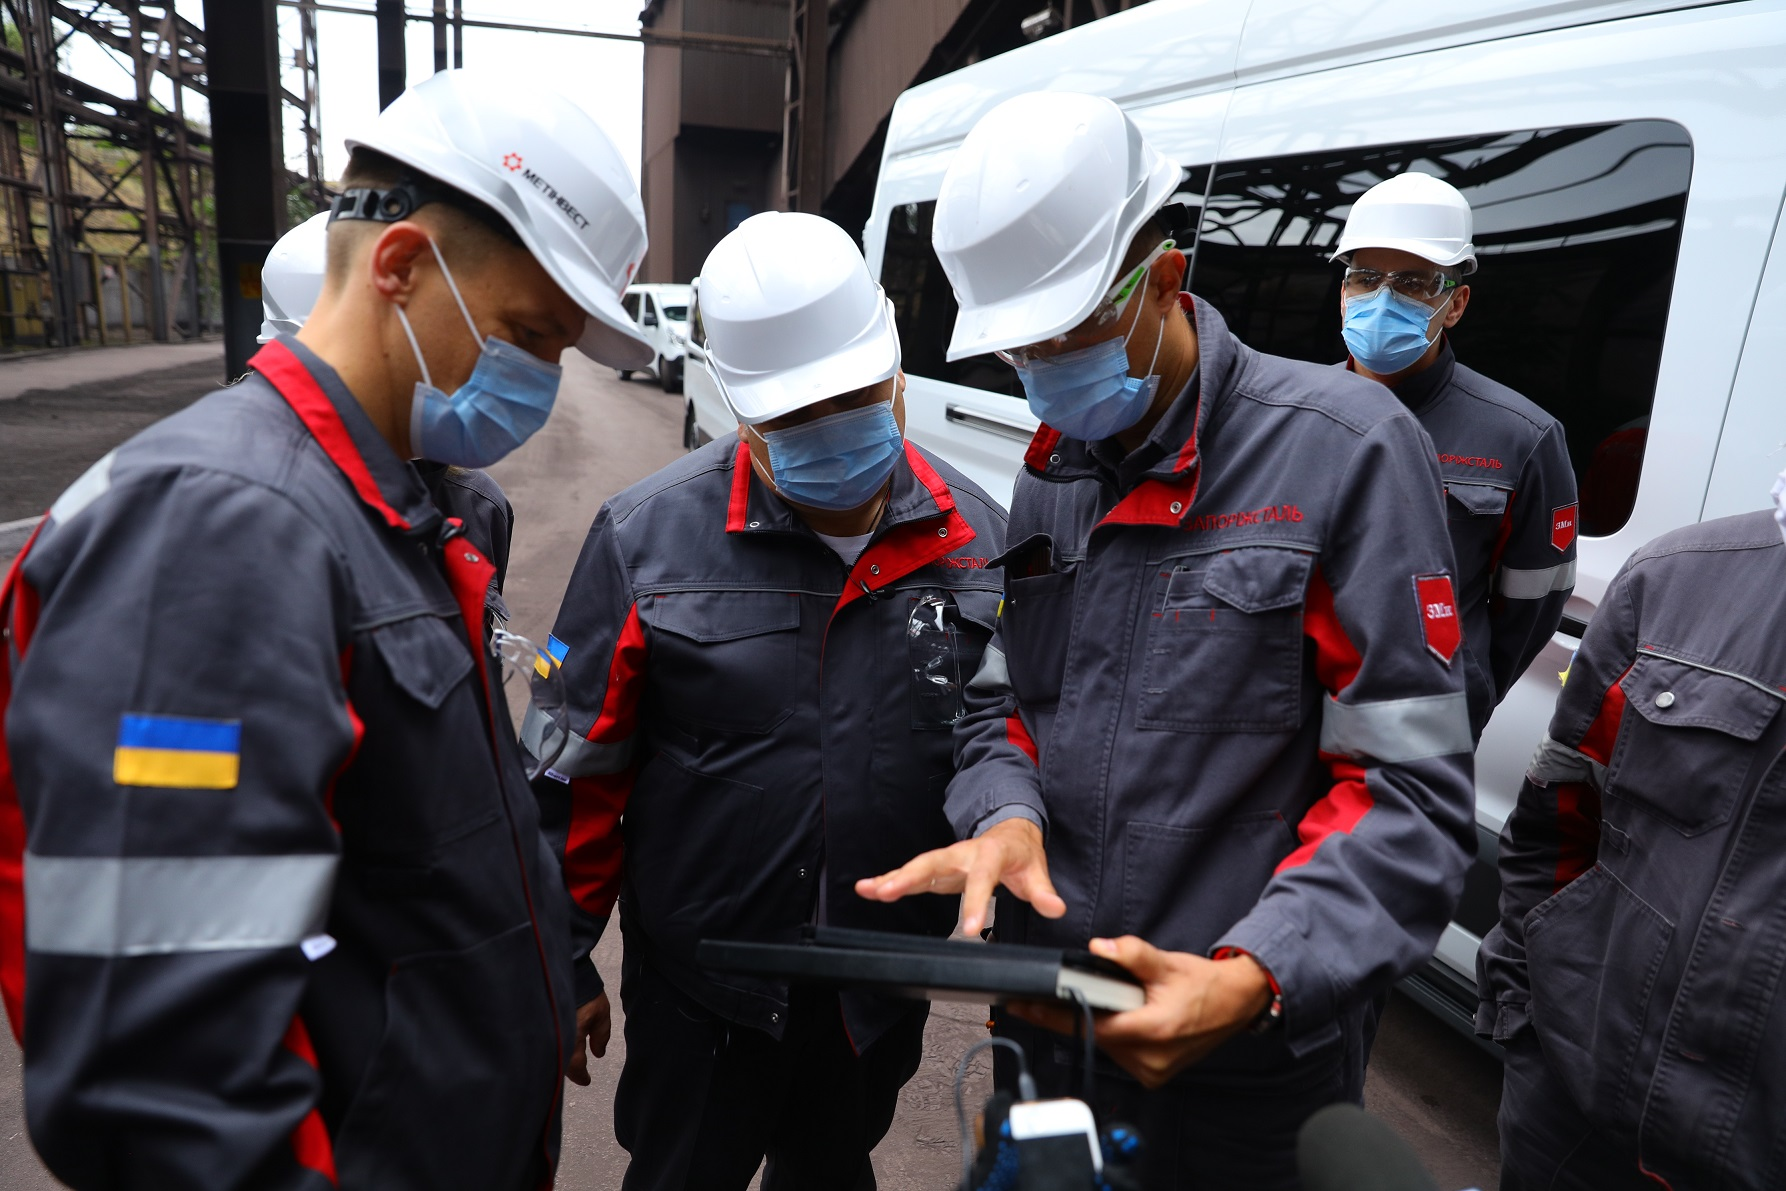 Qin AI Phone від Xiaomi коштуватиме 1500 грн